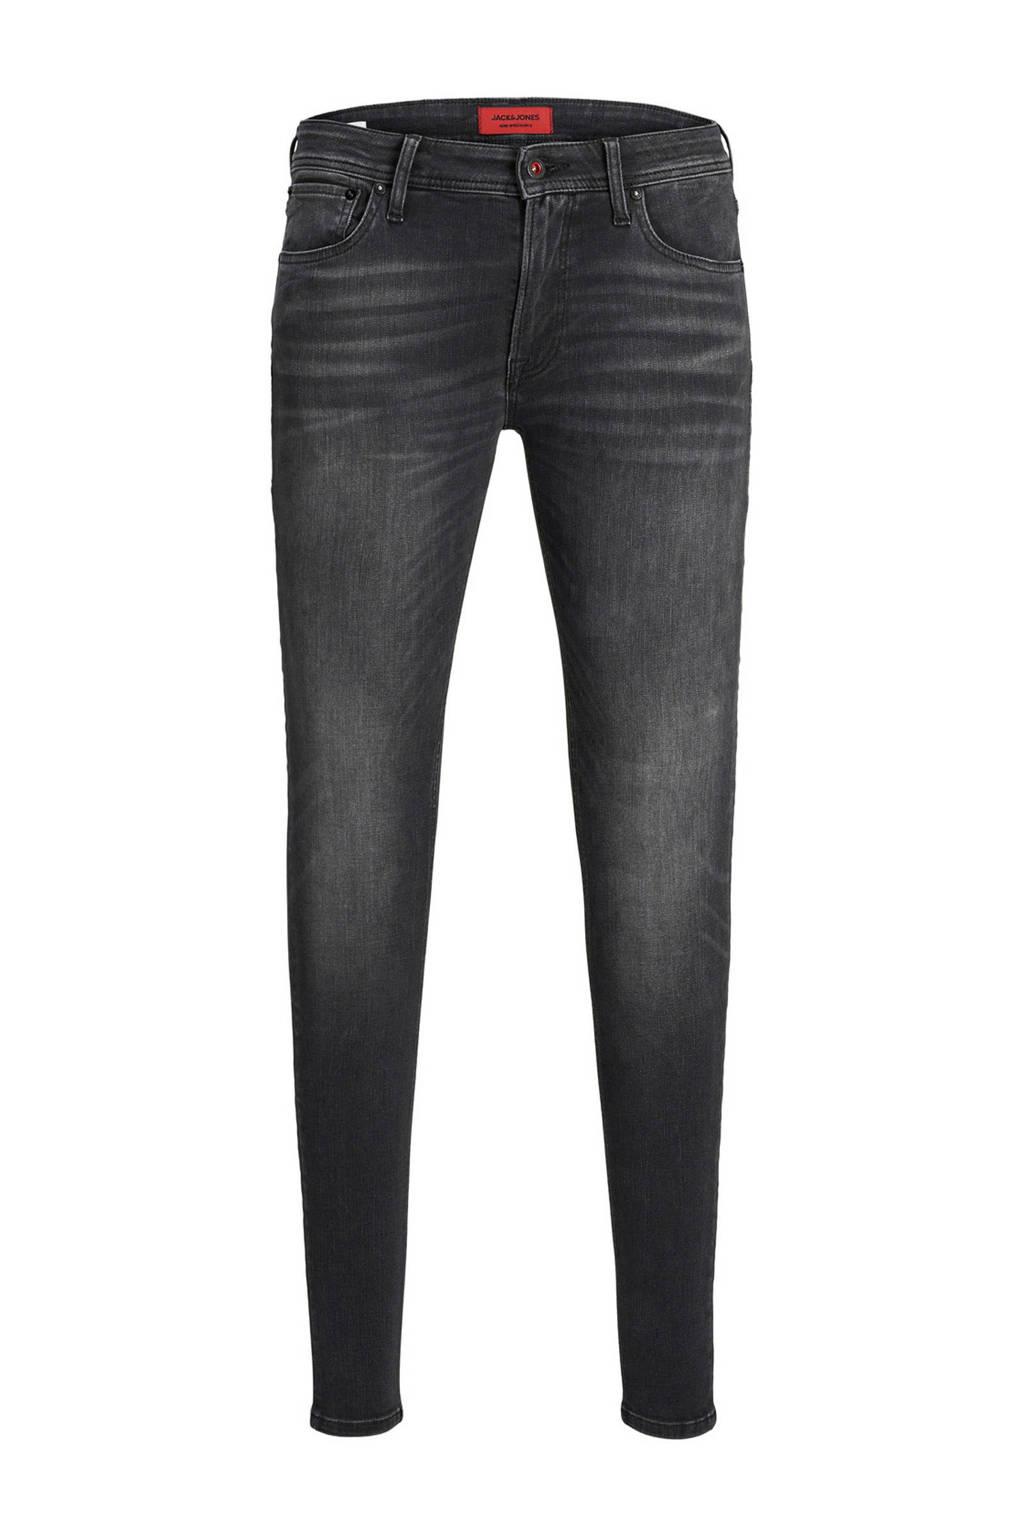 JACK & JONES JEANS INTELLIGENCE skinny jeans Tom zwart, Zwart